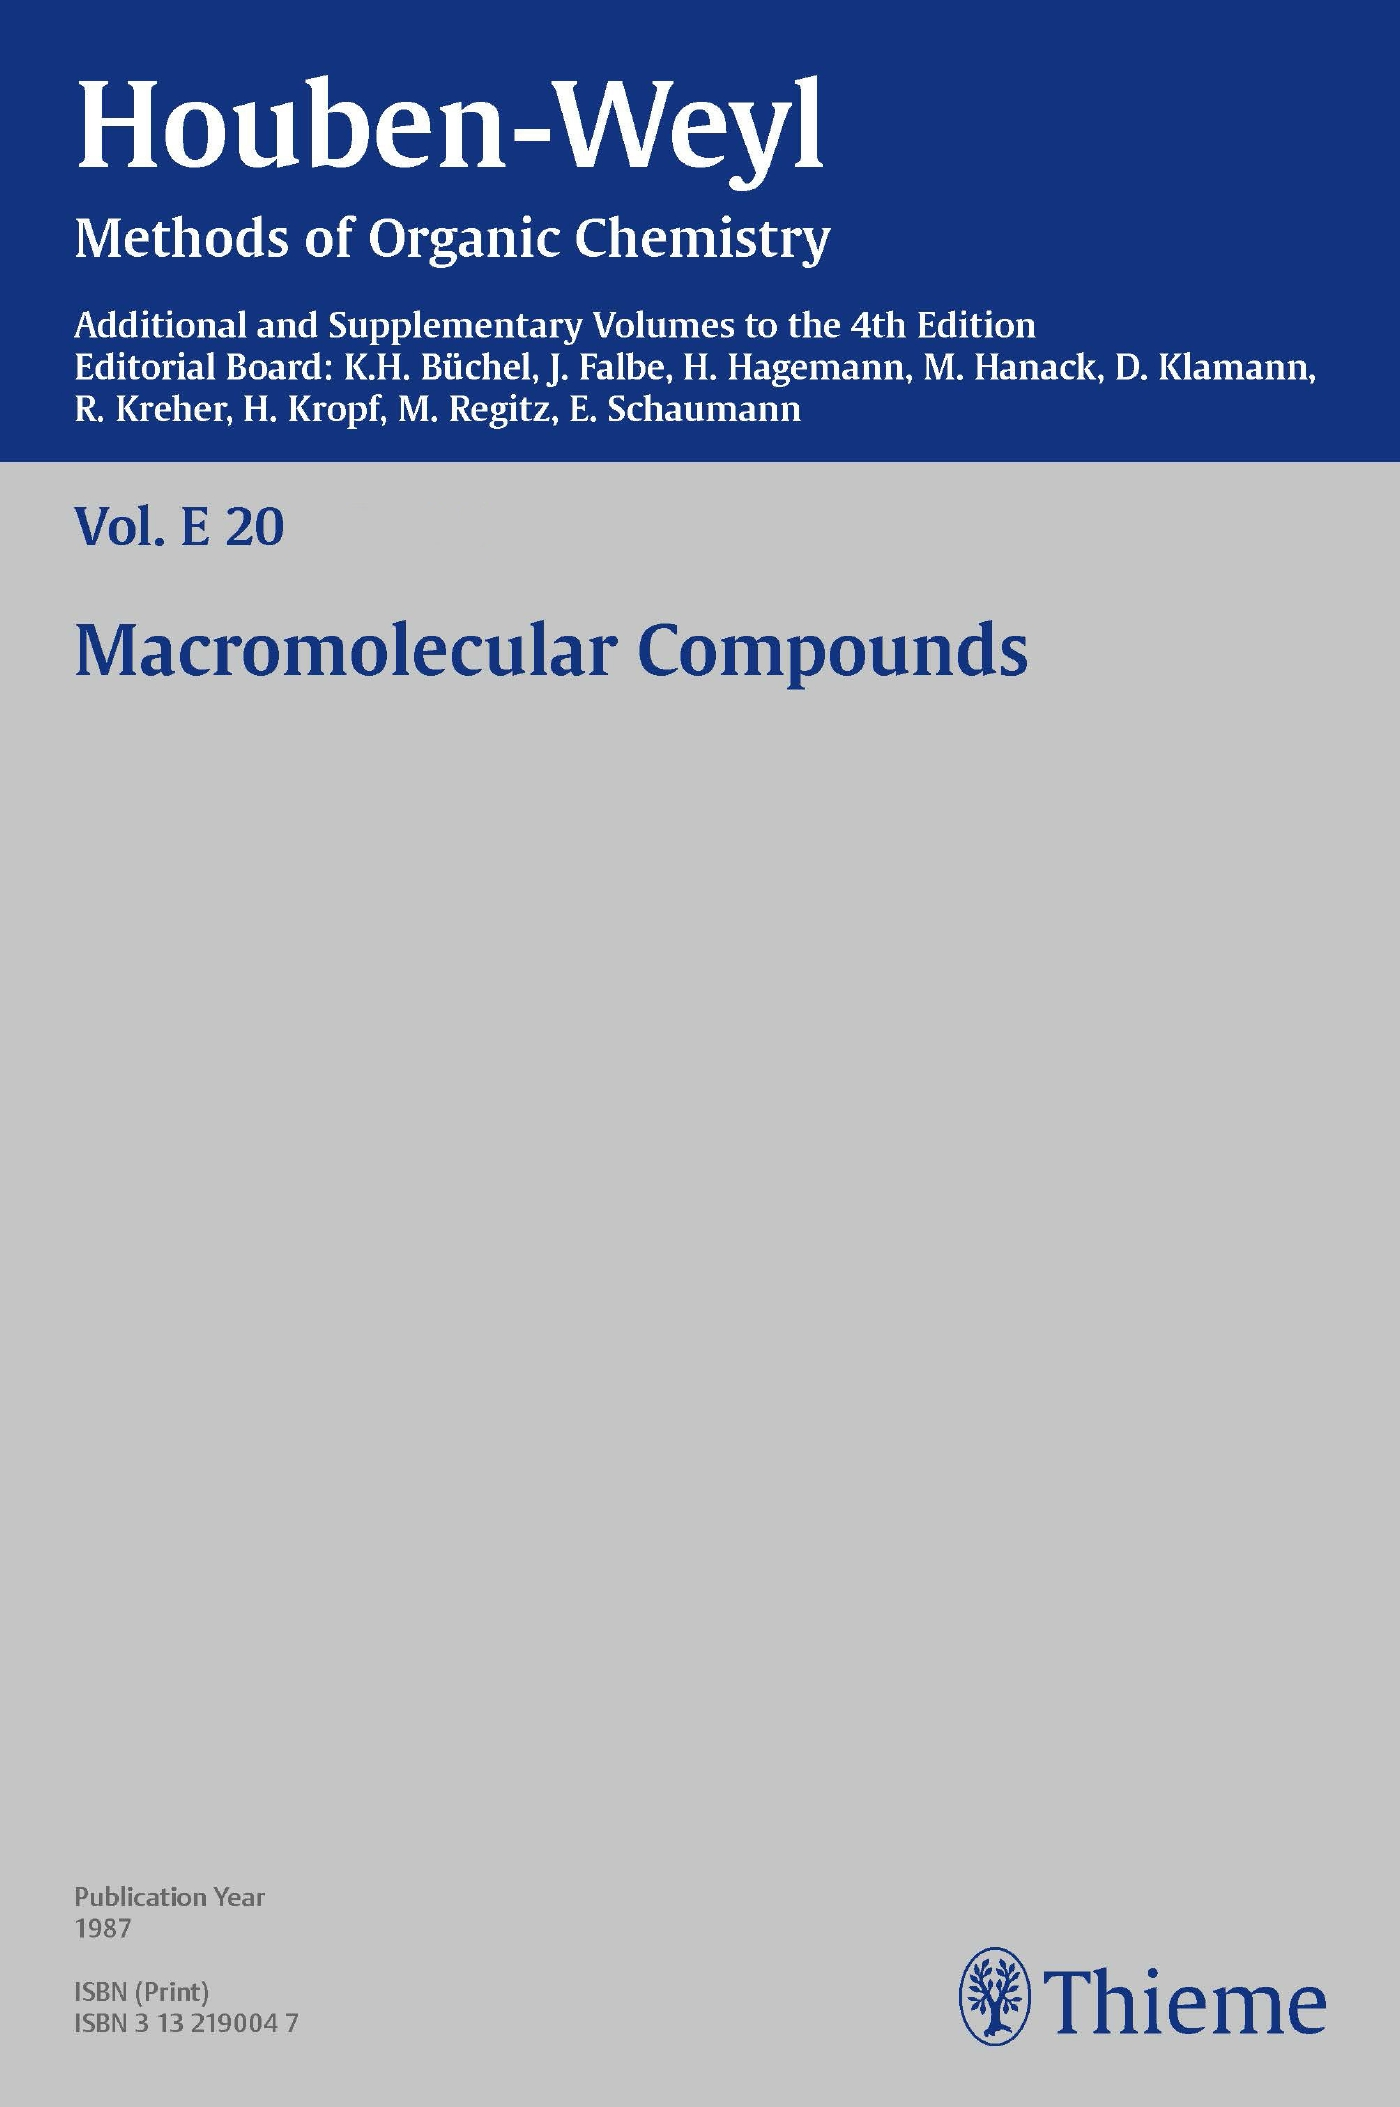 Houben-Weyl Methods of Organic Chemistry Vol. E 20, 4th Edition Supplement